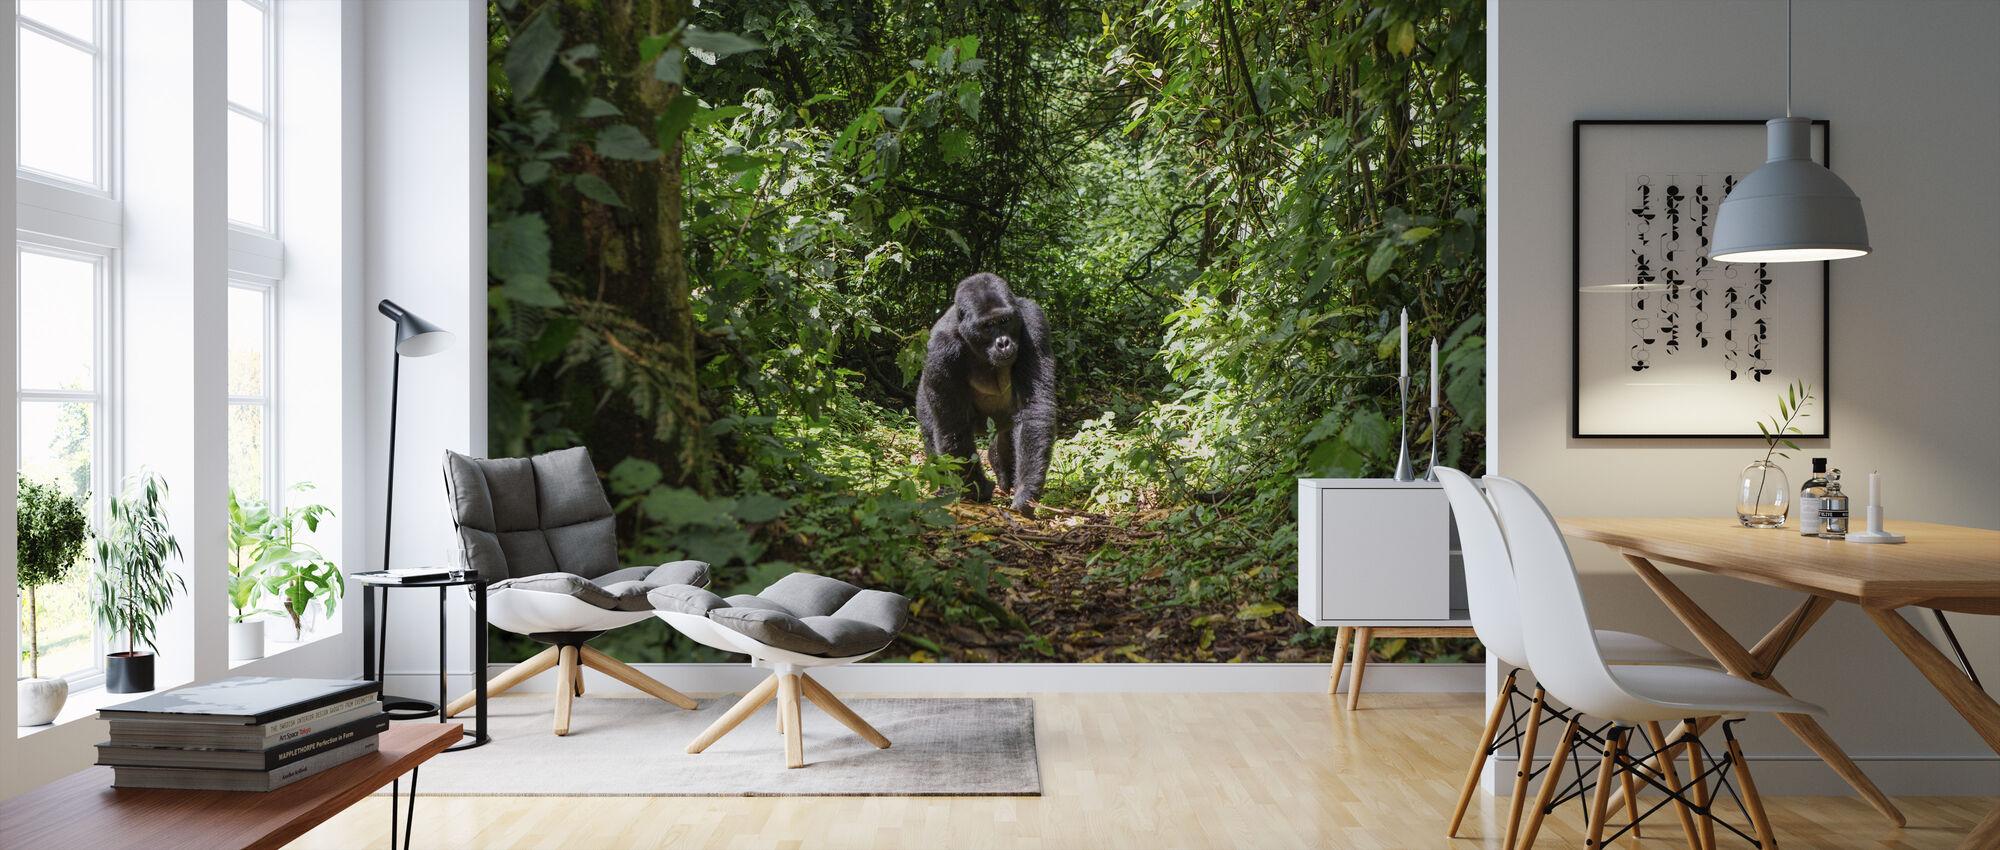 Male Mountain Gorilla - Wallpaper - Living Room